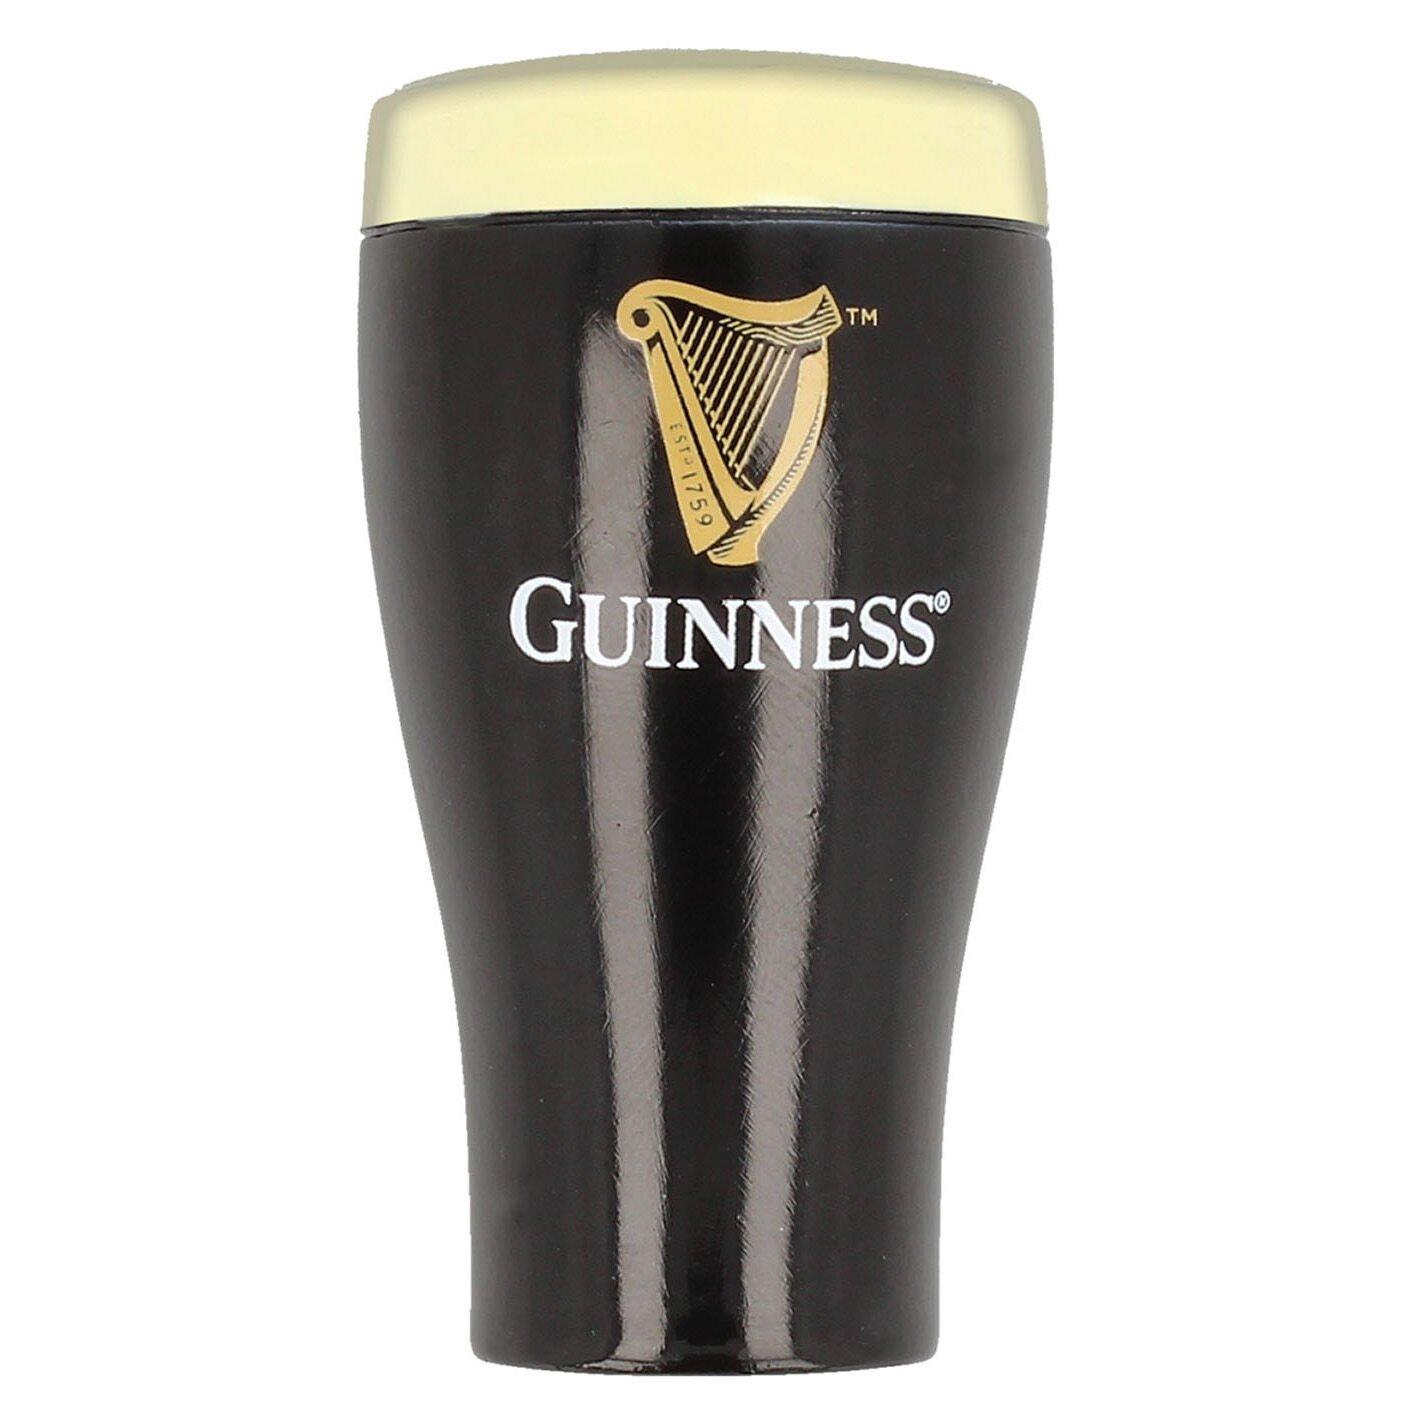 Calamita Guinness in Resina con Disegno Pinta 3D - Viaggiare in Irlanda